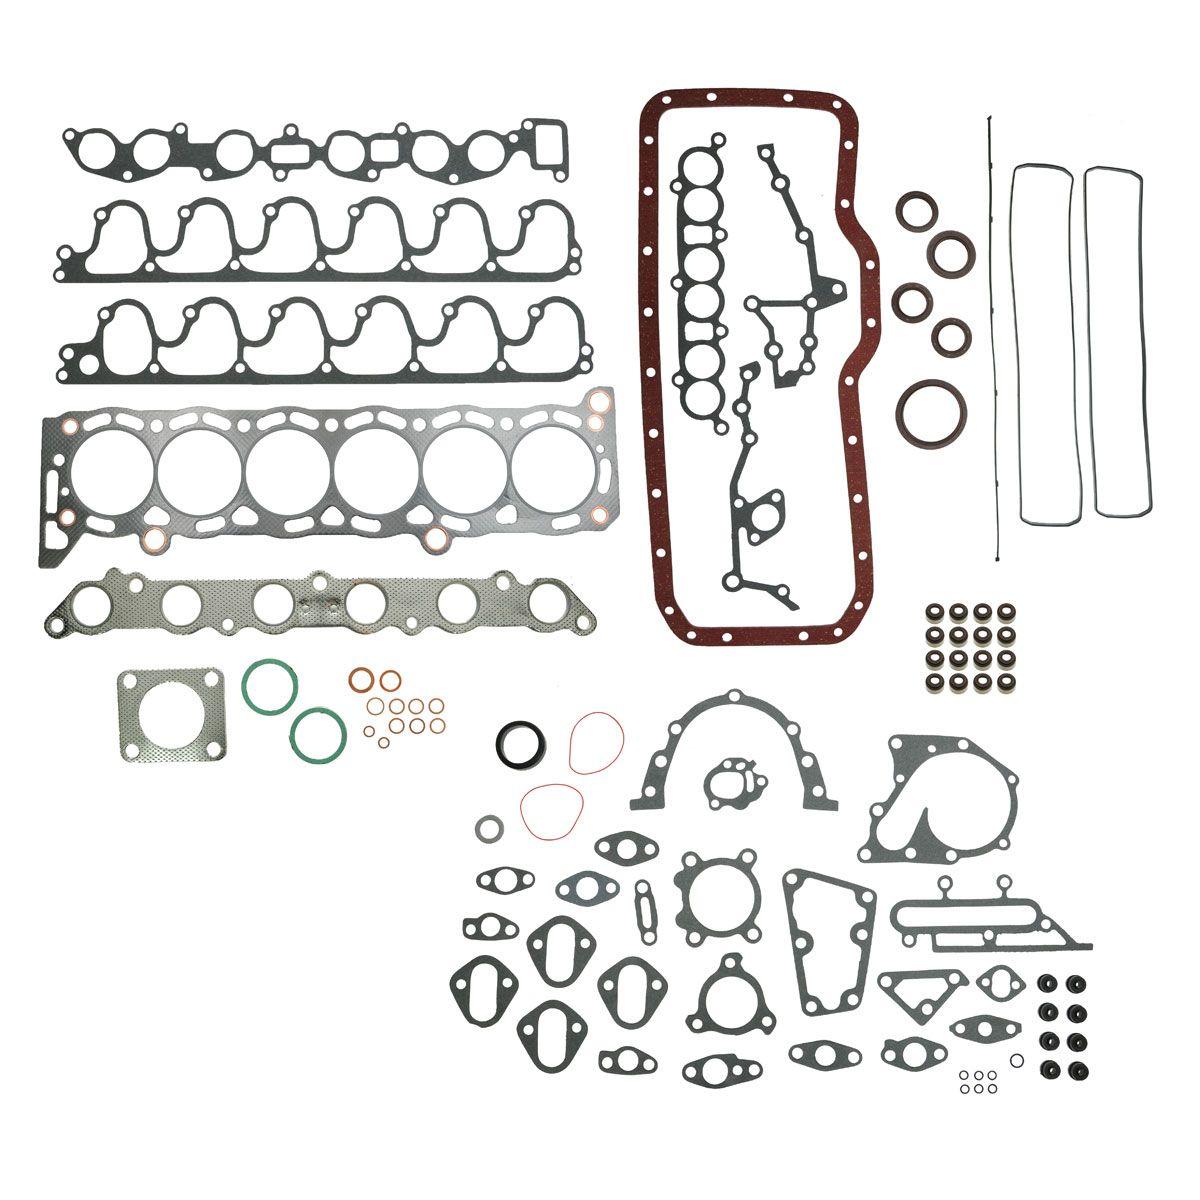 5mge Toyota Engine Parts Diagram Start Building A Wiring Motor Complete Head Manifold Gasket Set For Supra Rh Ebay Com 20r